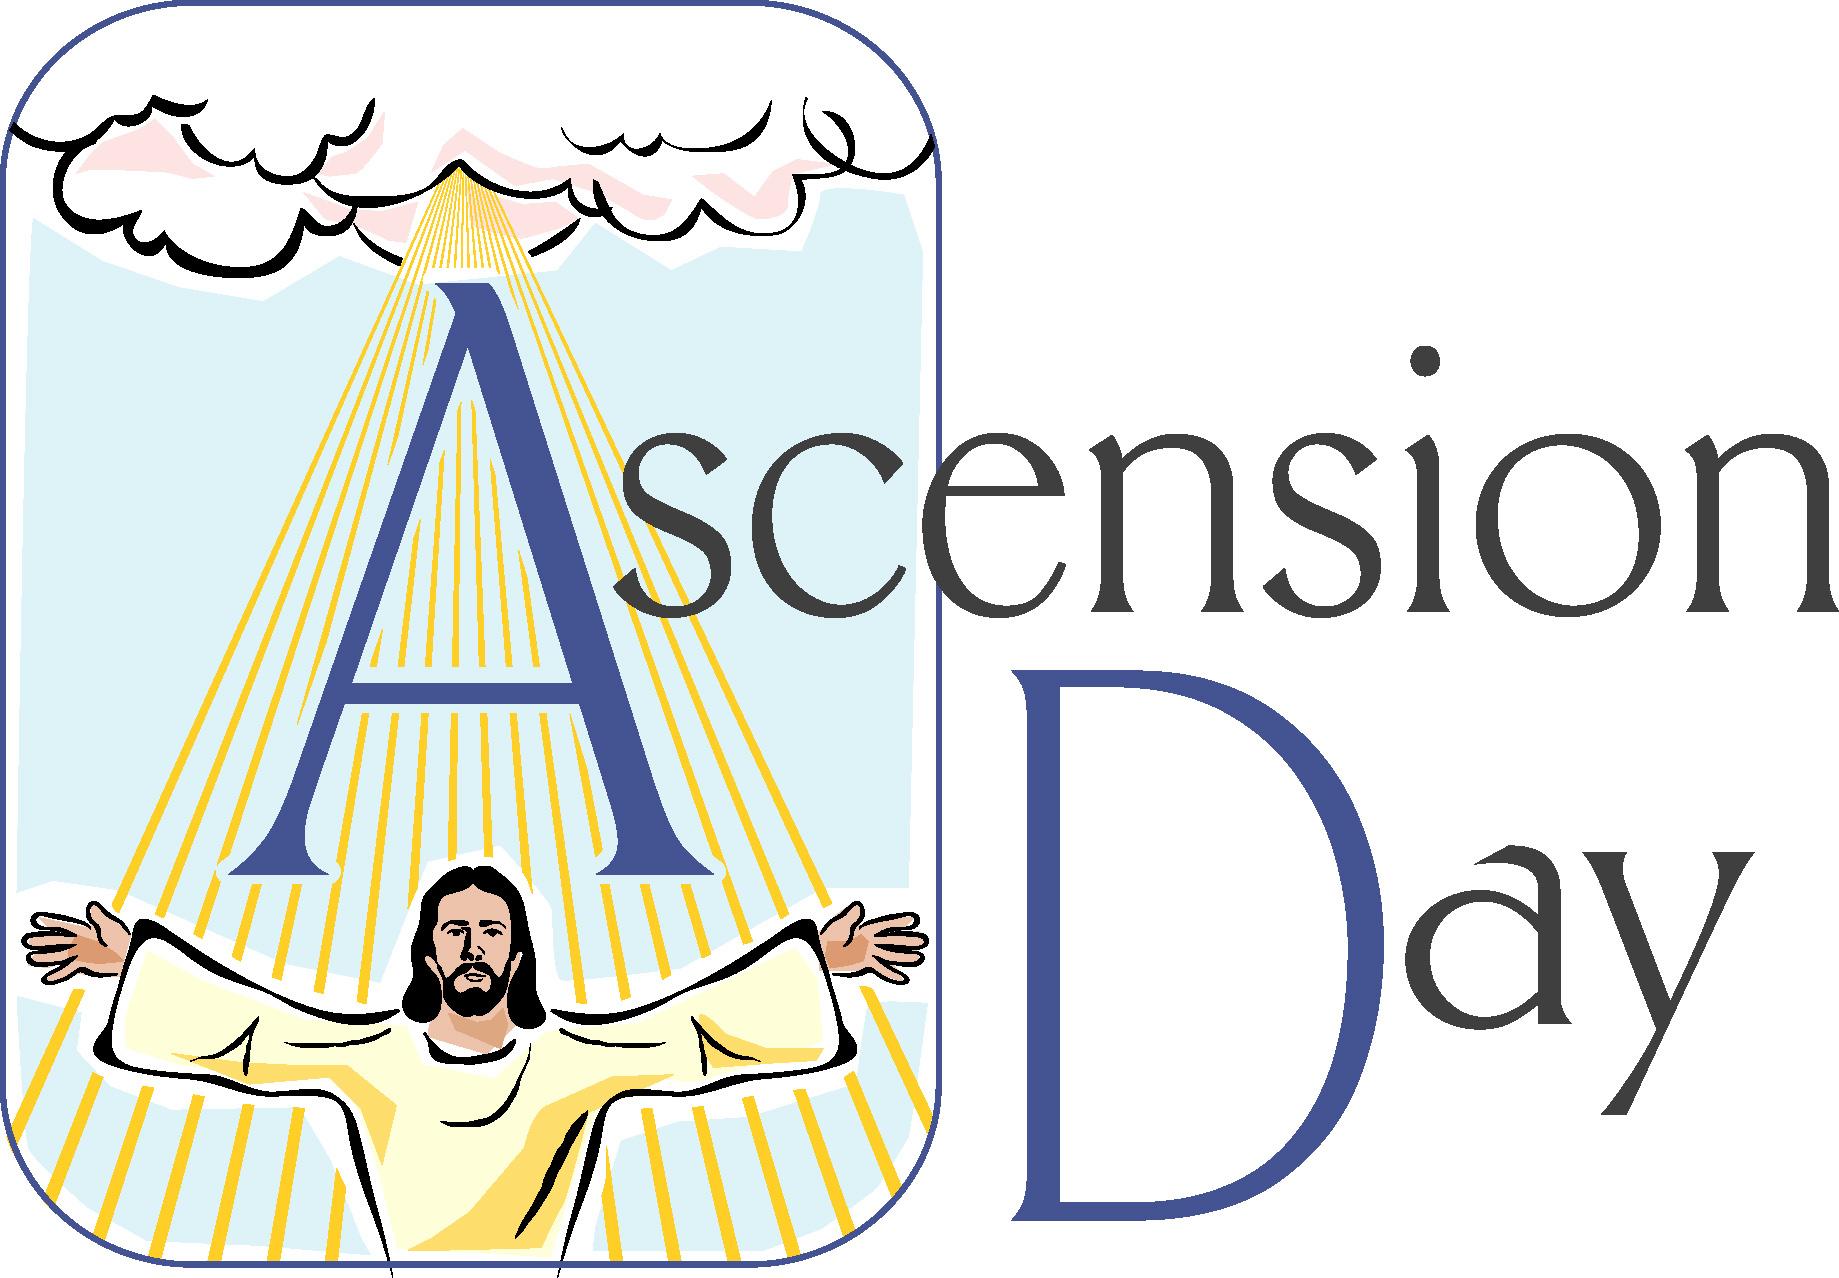 ascension day pinnacle lutheran church